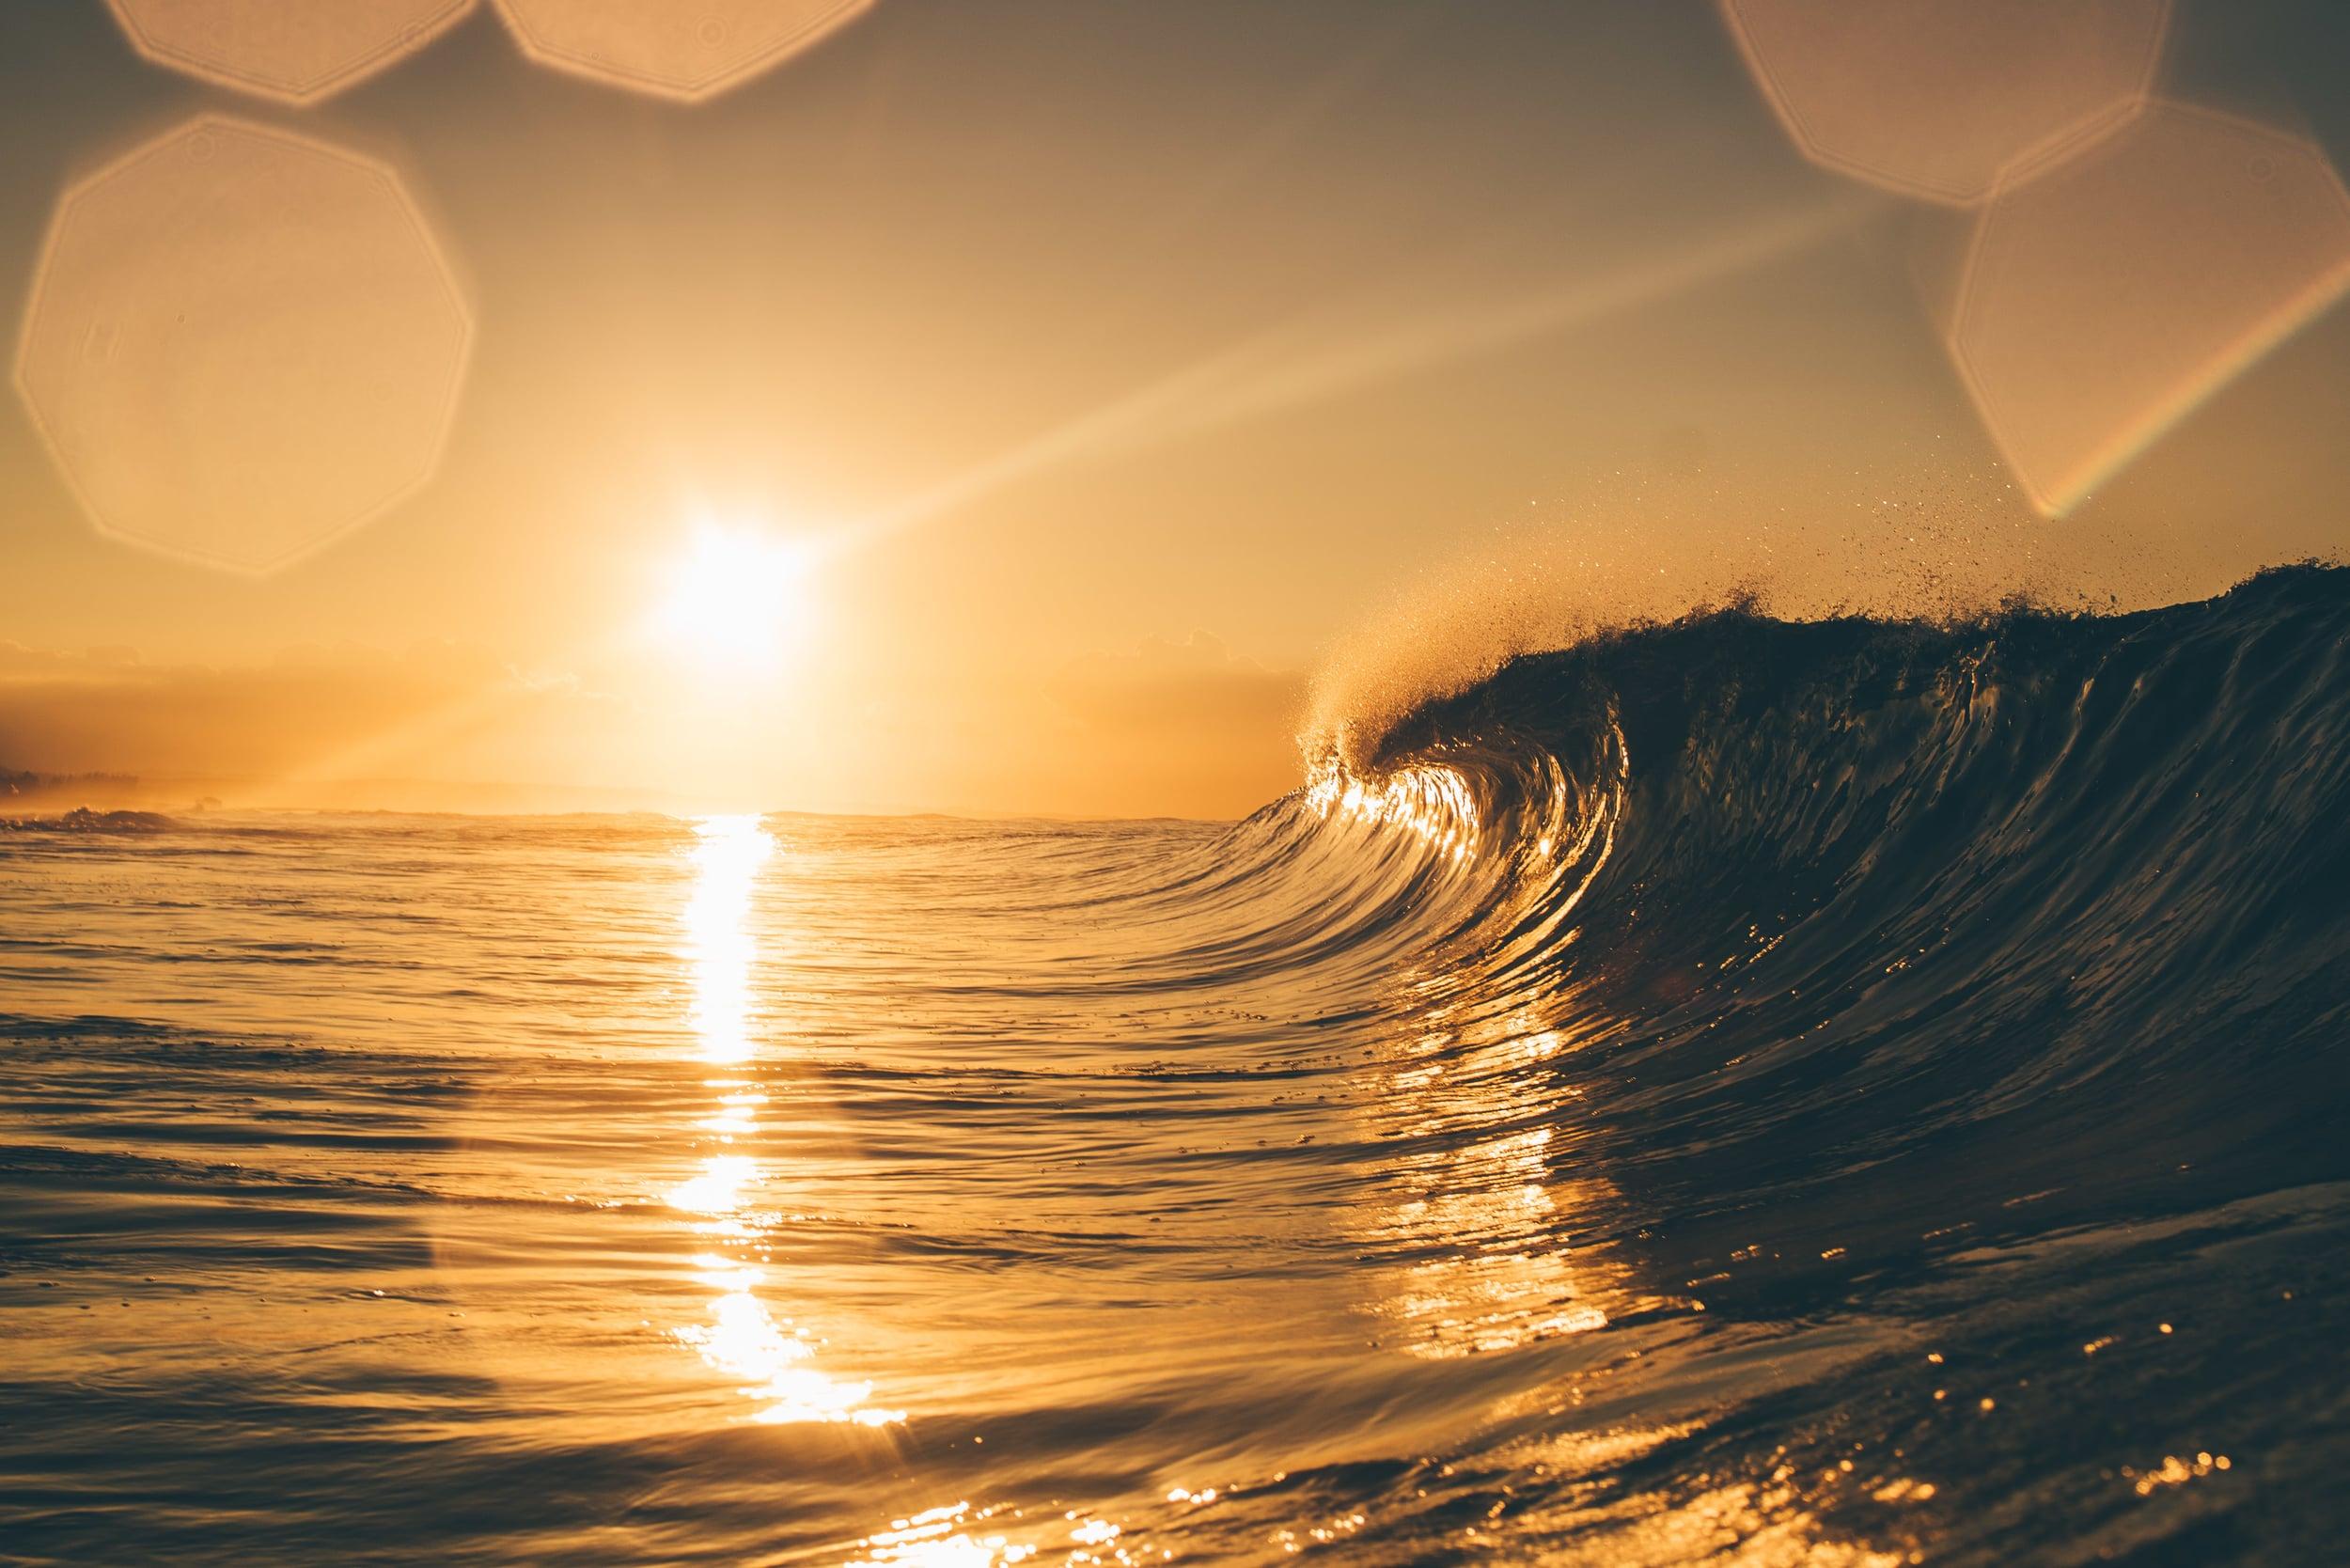 bryce-johnson-photography-kauai-hawaii-surfing-a7rii-aquatech-water-ocean-14.jpg